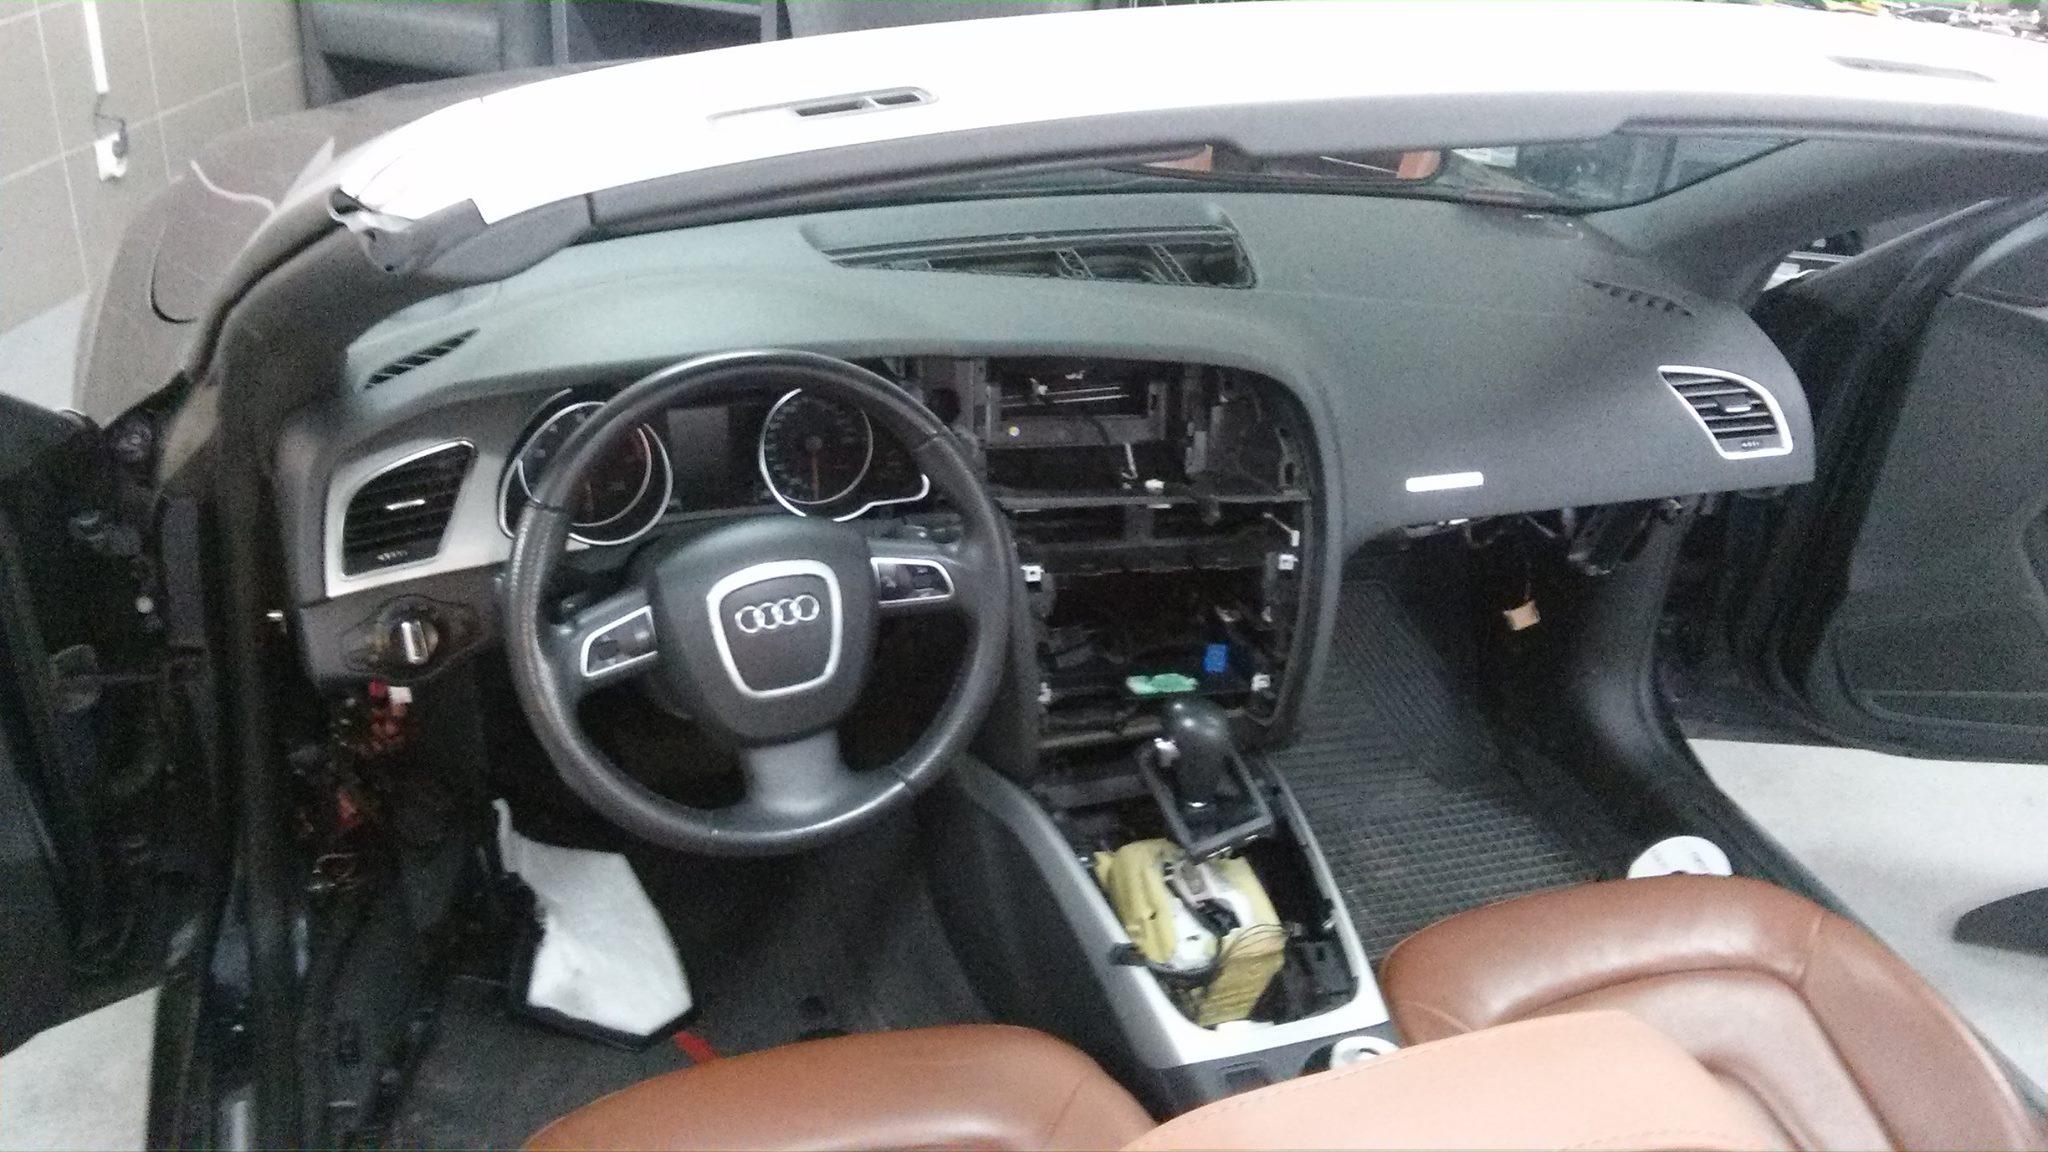 AUDI A5 2.0 T QUATTRO 2011 CABRIO